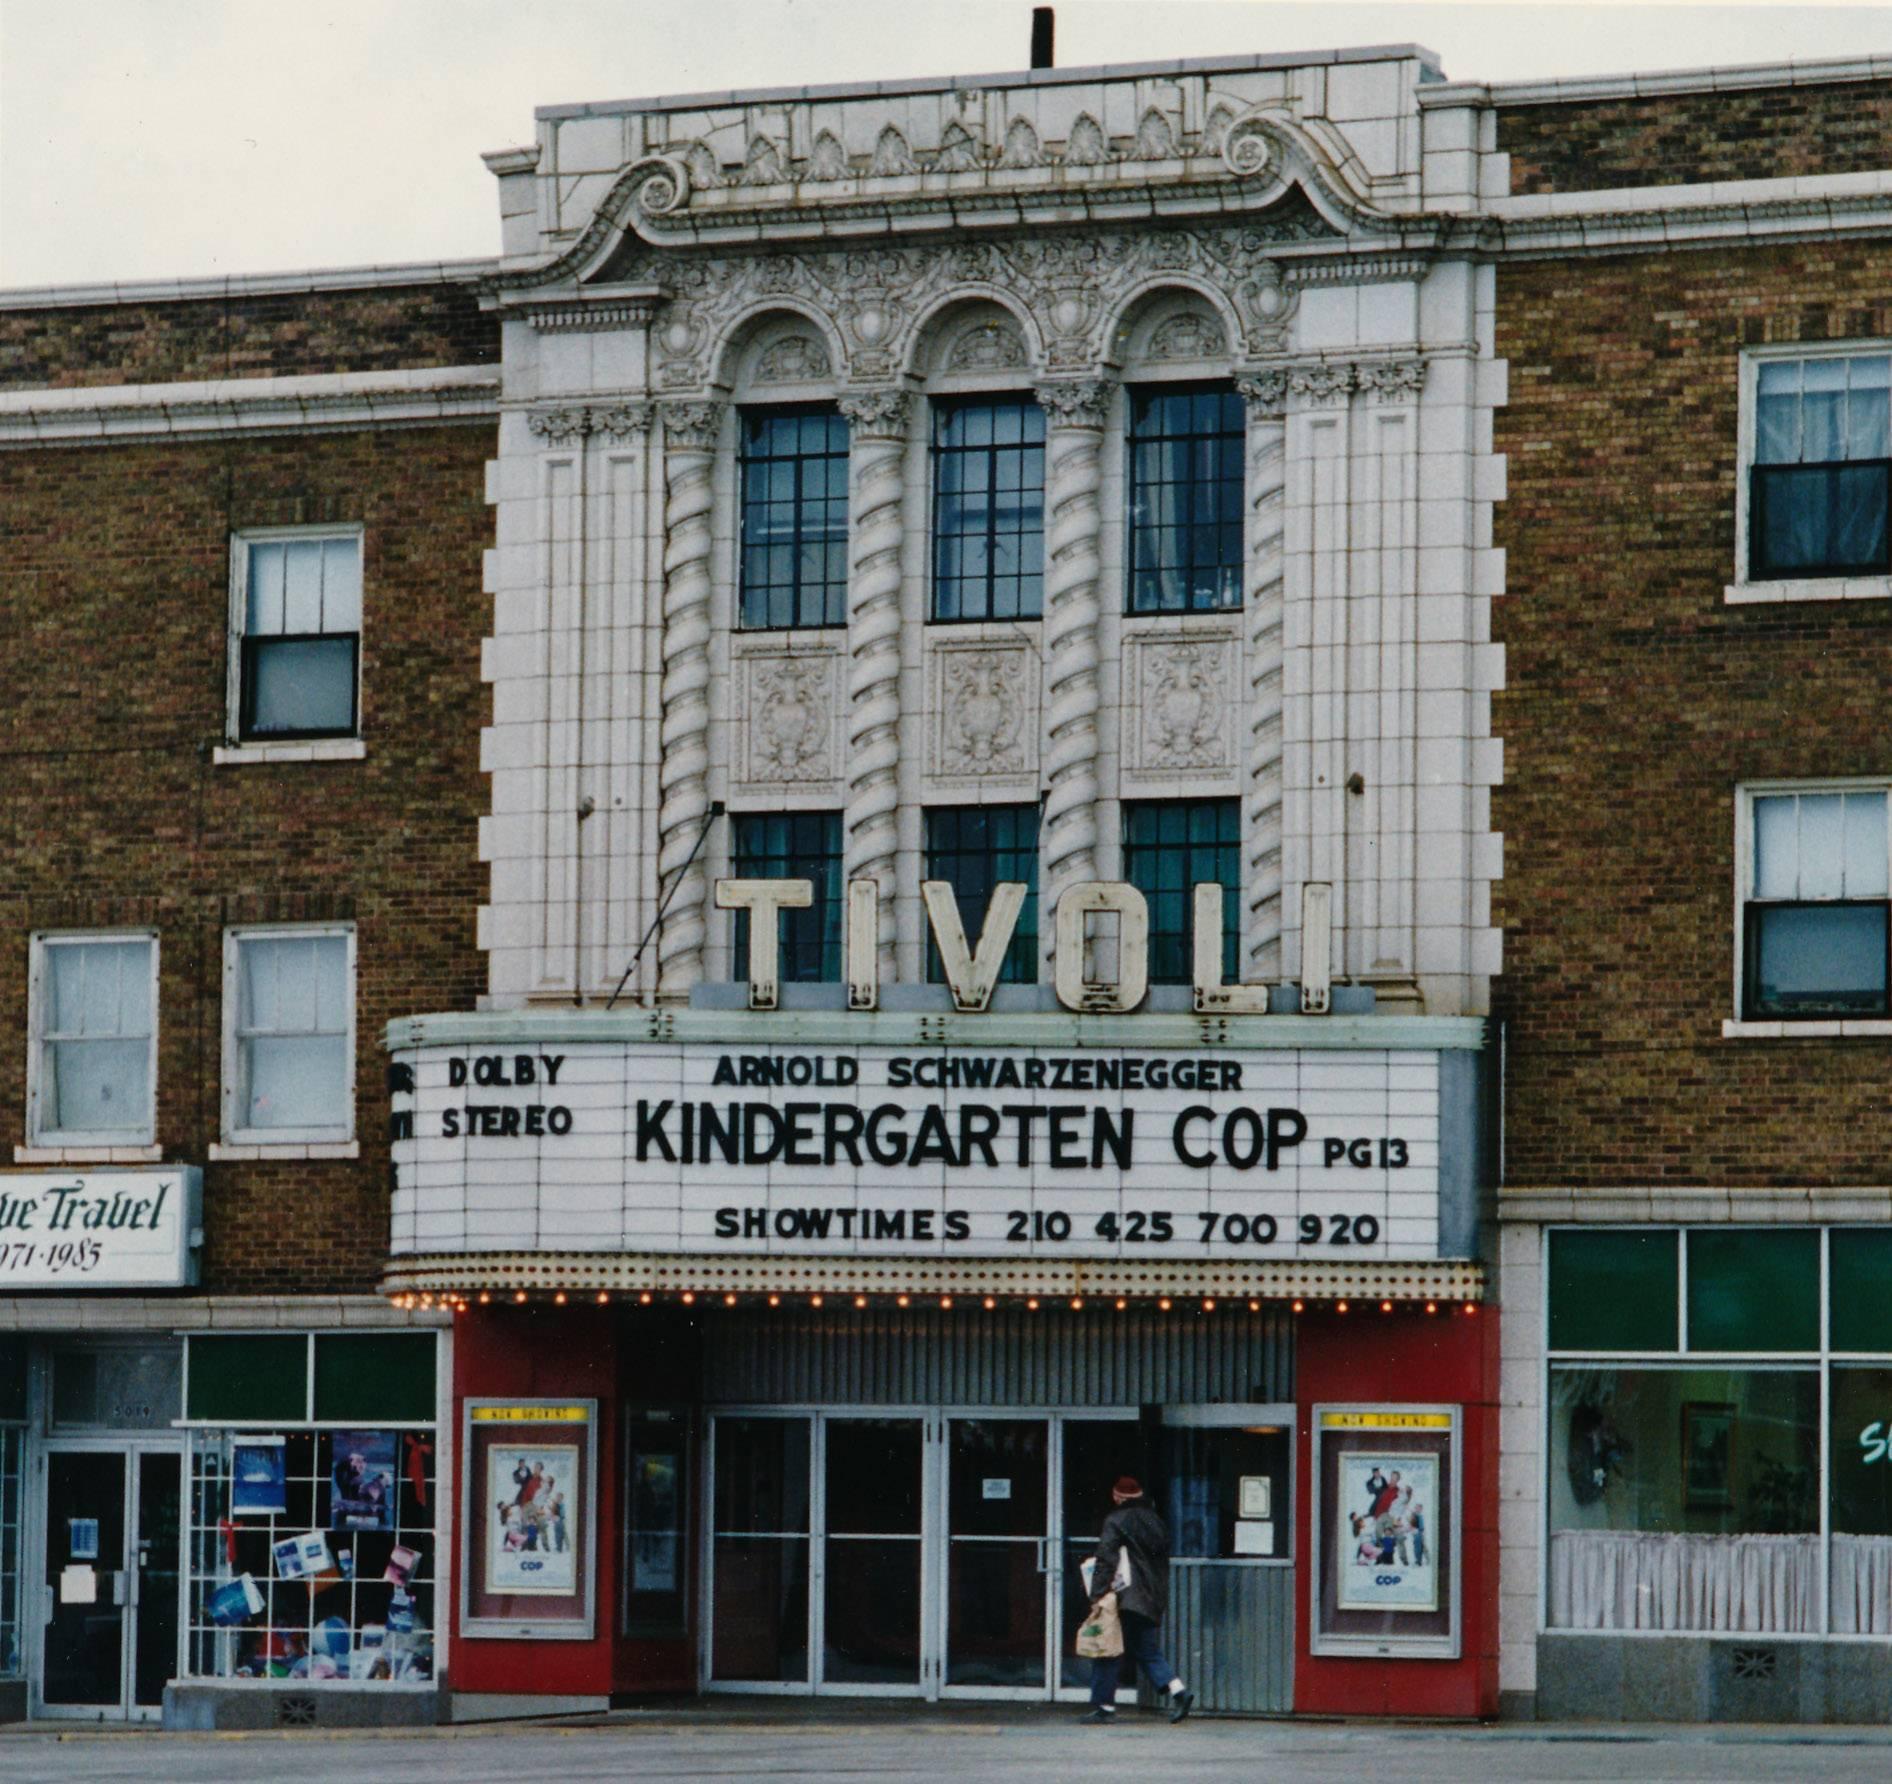 Tivoli movie theater